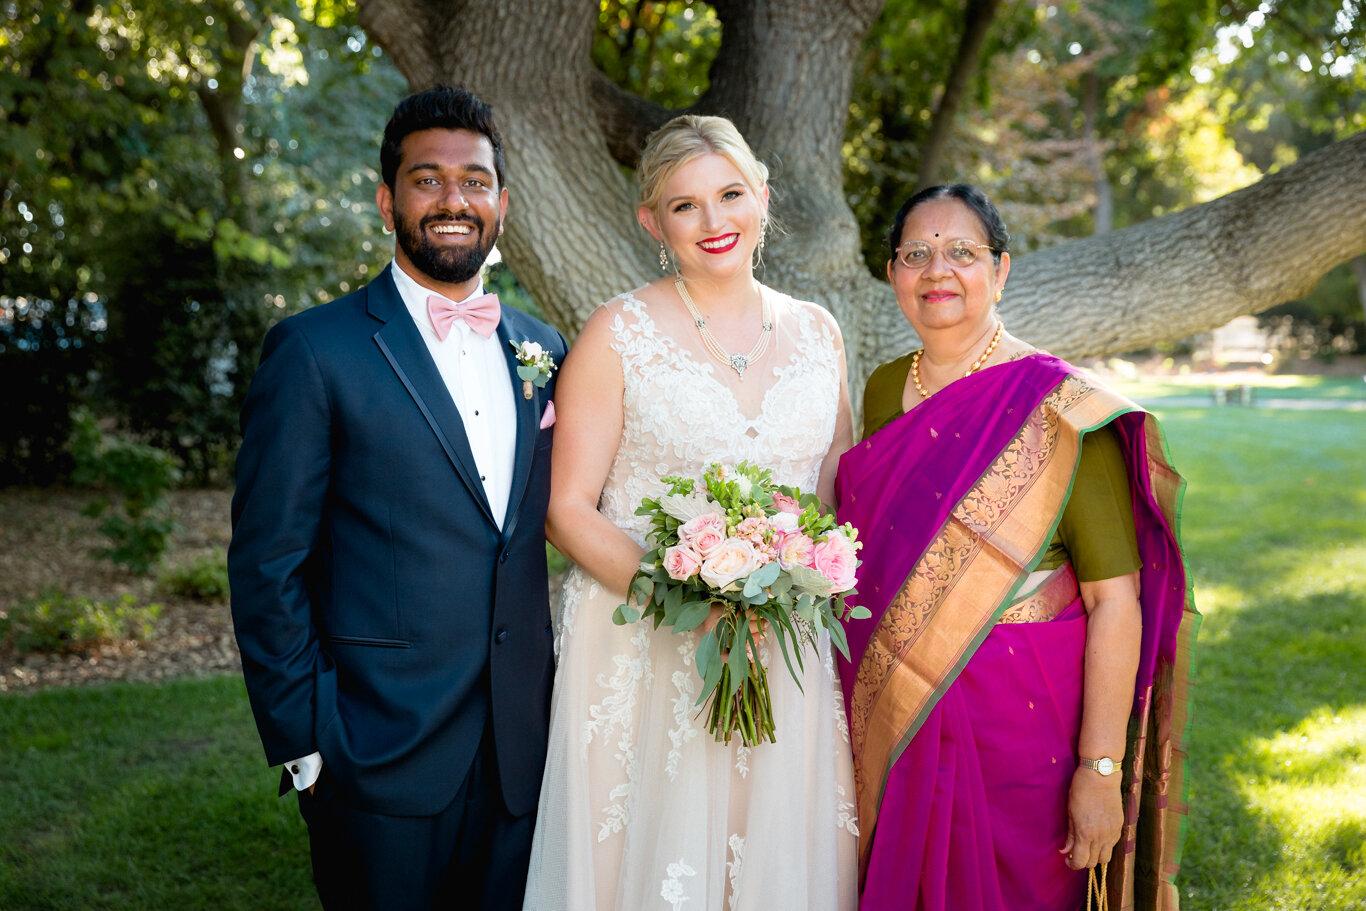 2019.08.24_Emily-Ashir-Wedding-at-the-Maples-5941.jpg